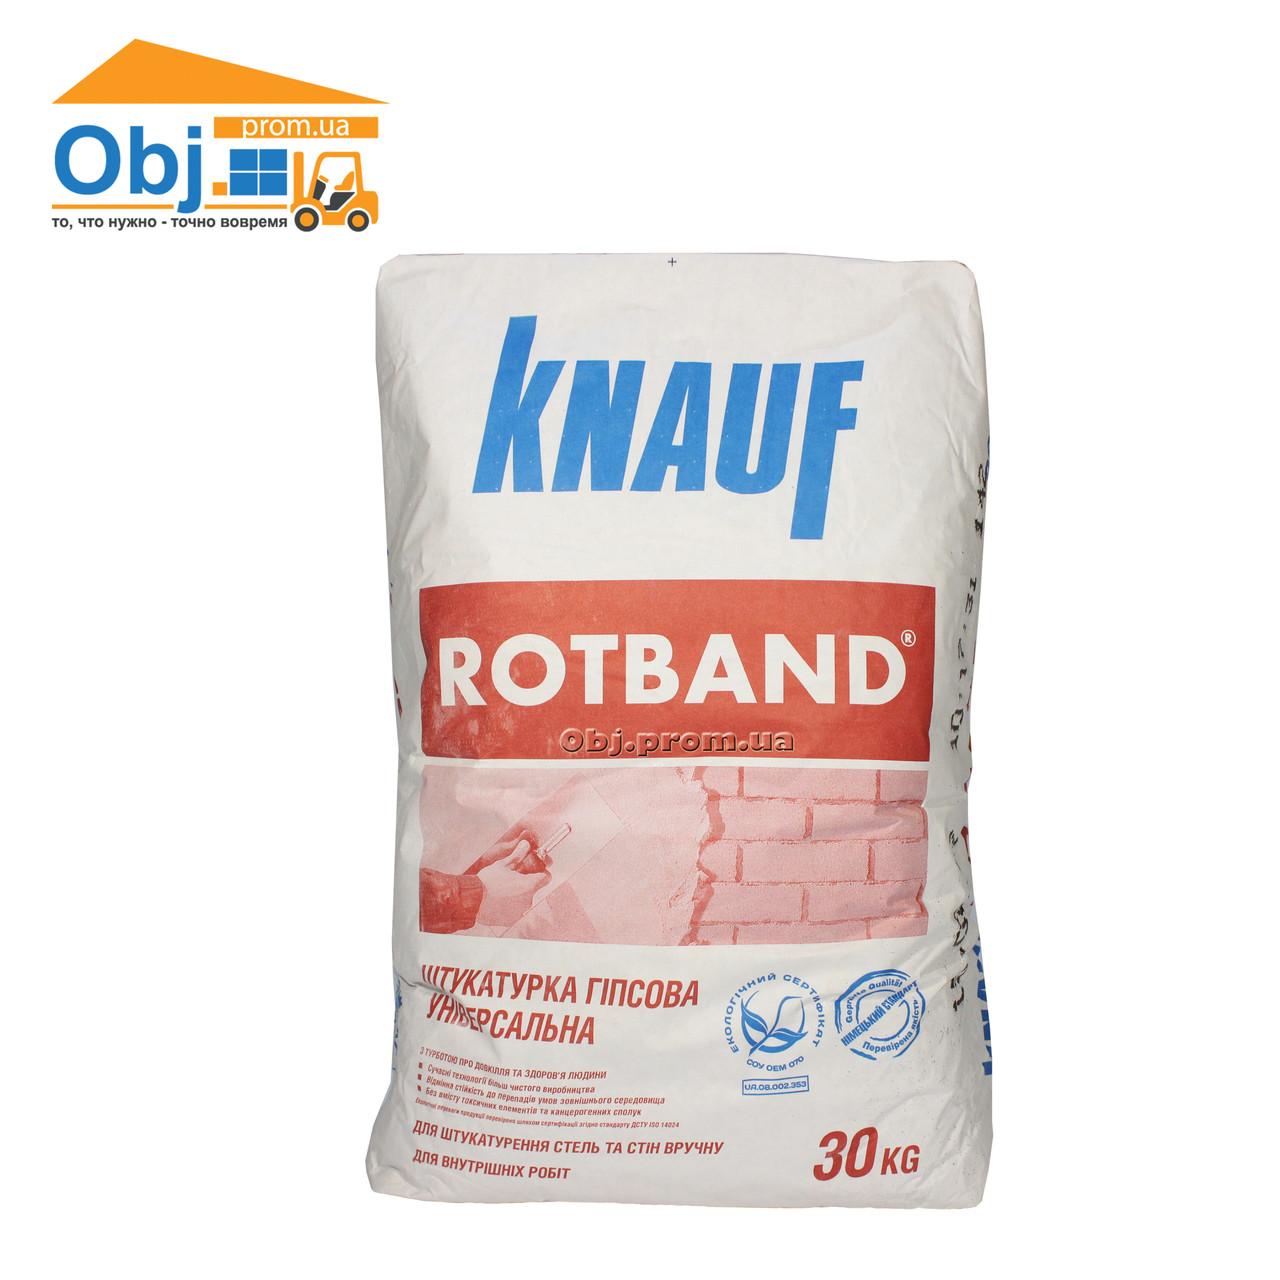 Ротбанд штукатурка гипсовая knauf rotband (30кг), цена 143,37 грн